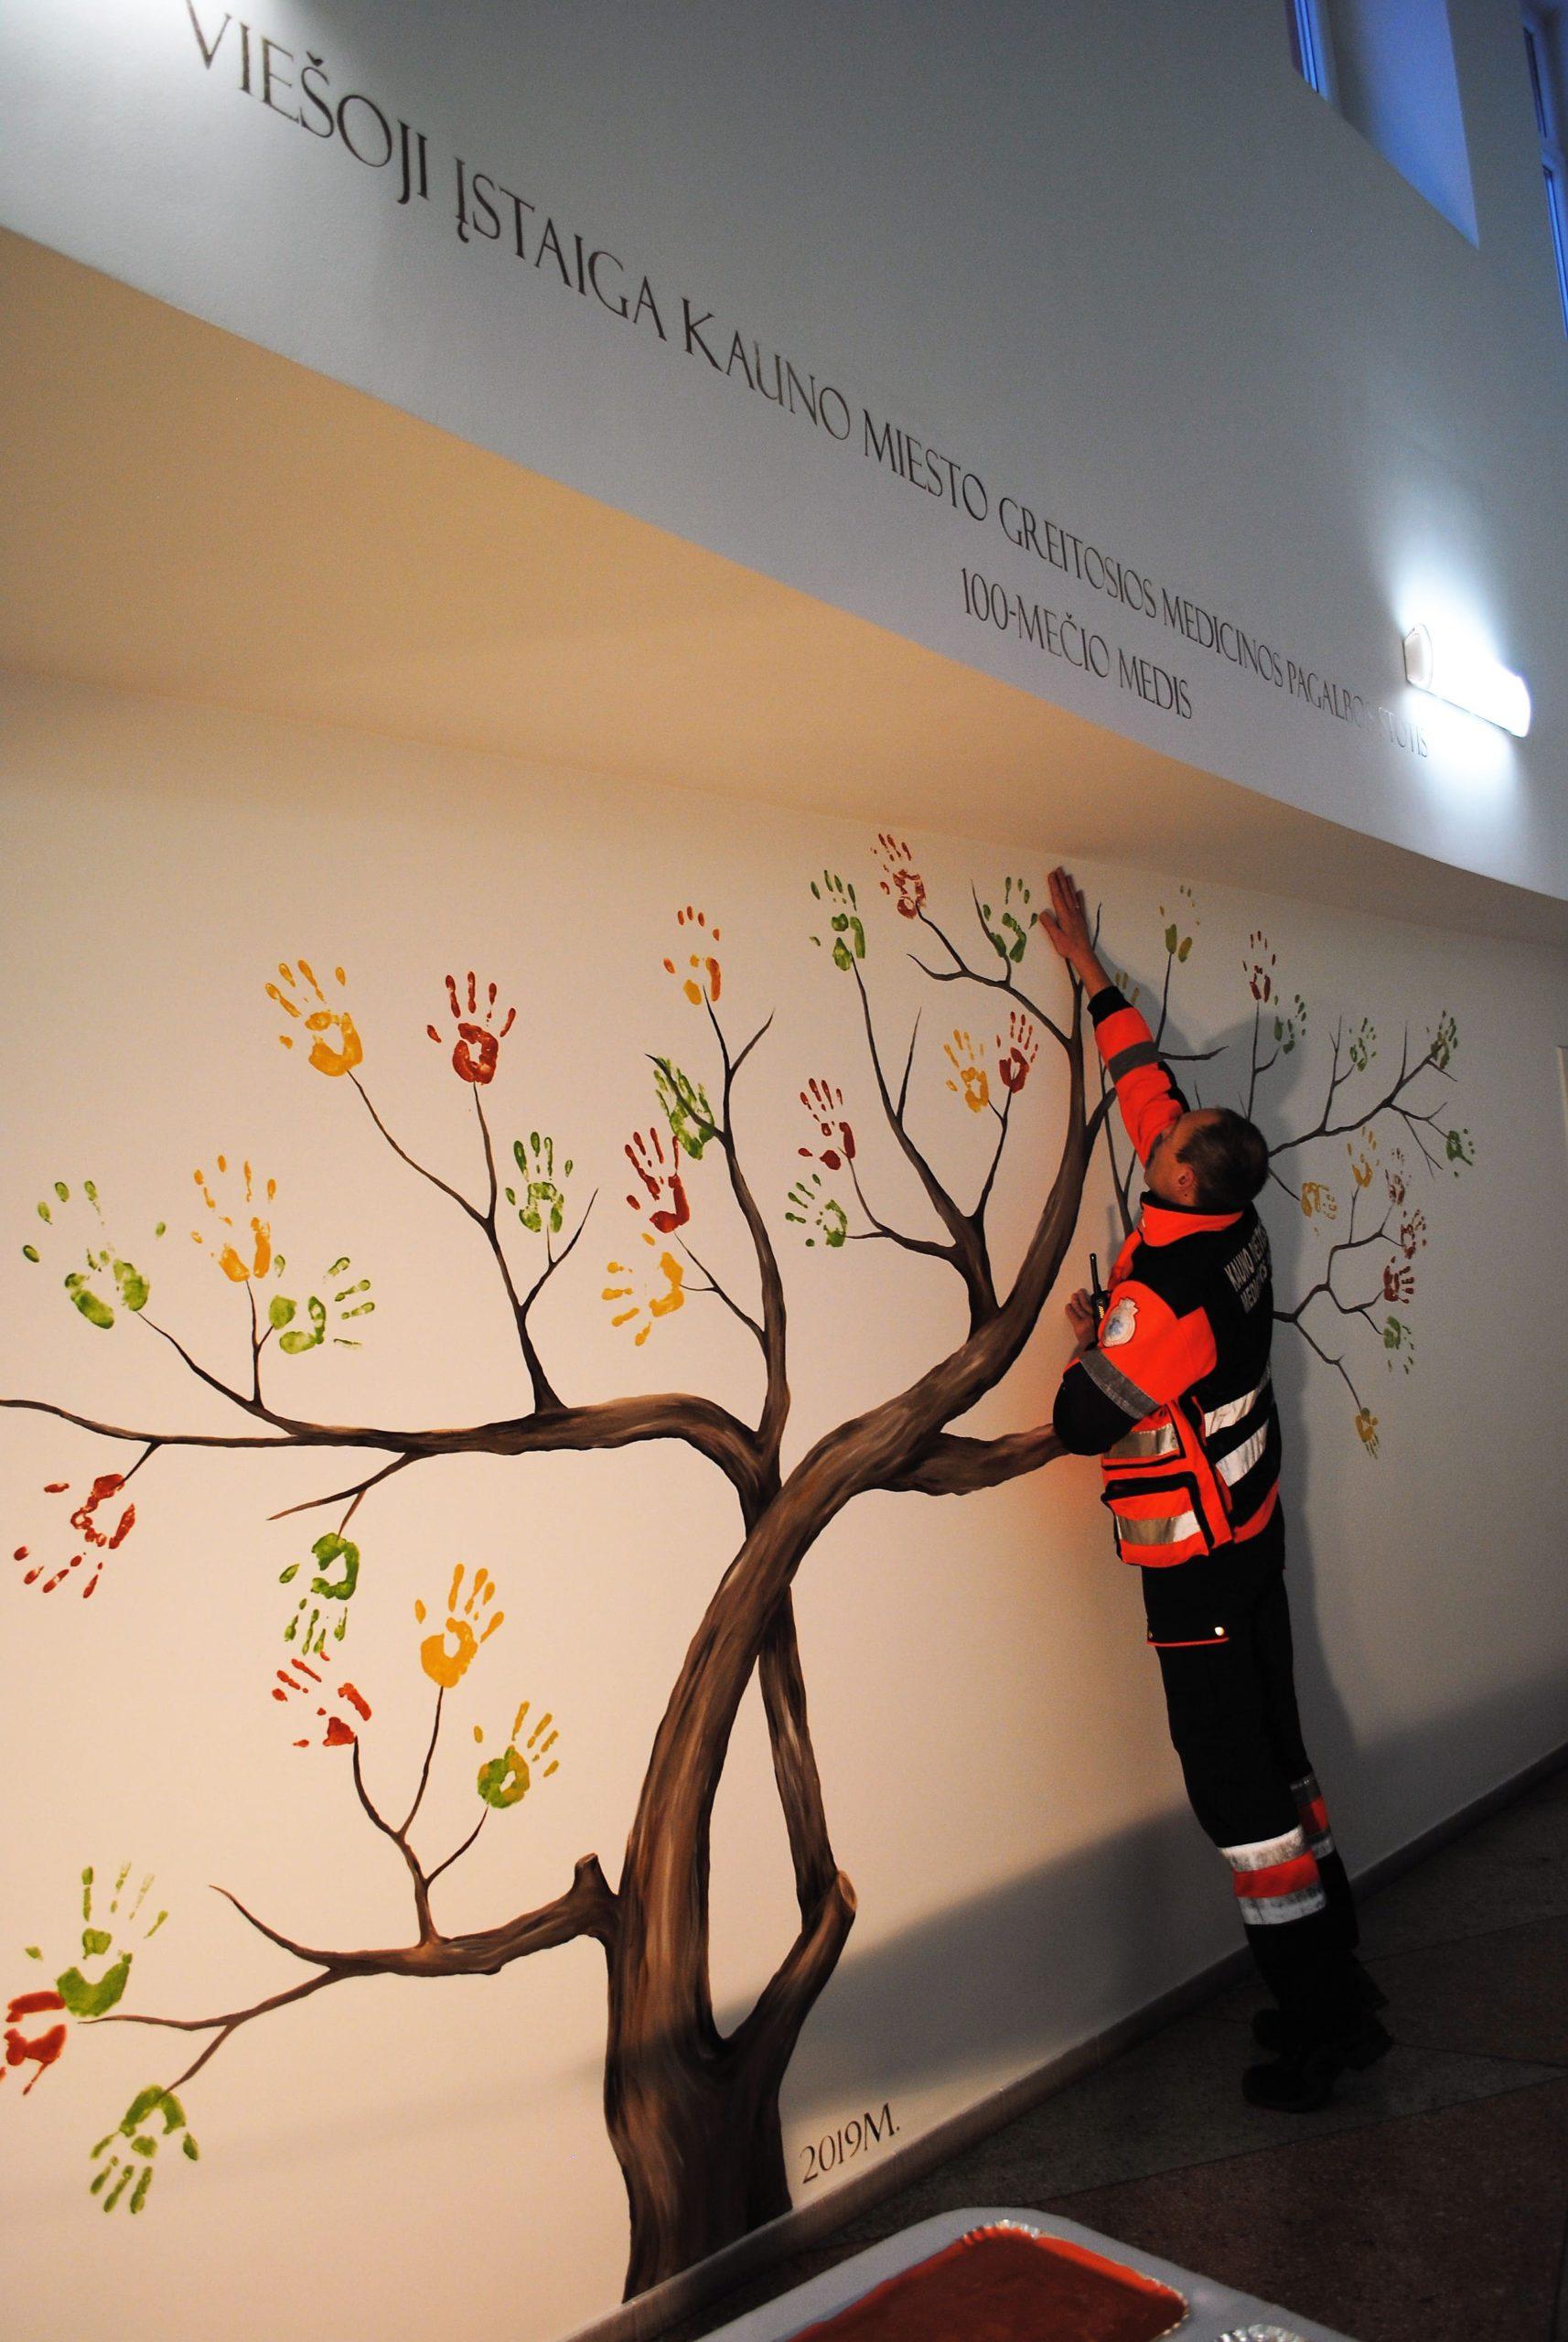 menine-kuryba-sienu-dekoravimas-ivairus-interjerai (34)